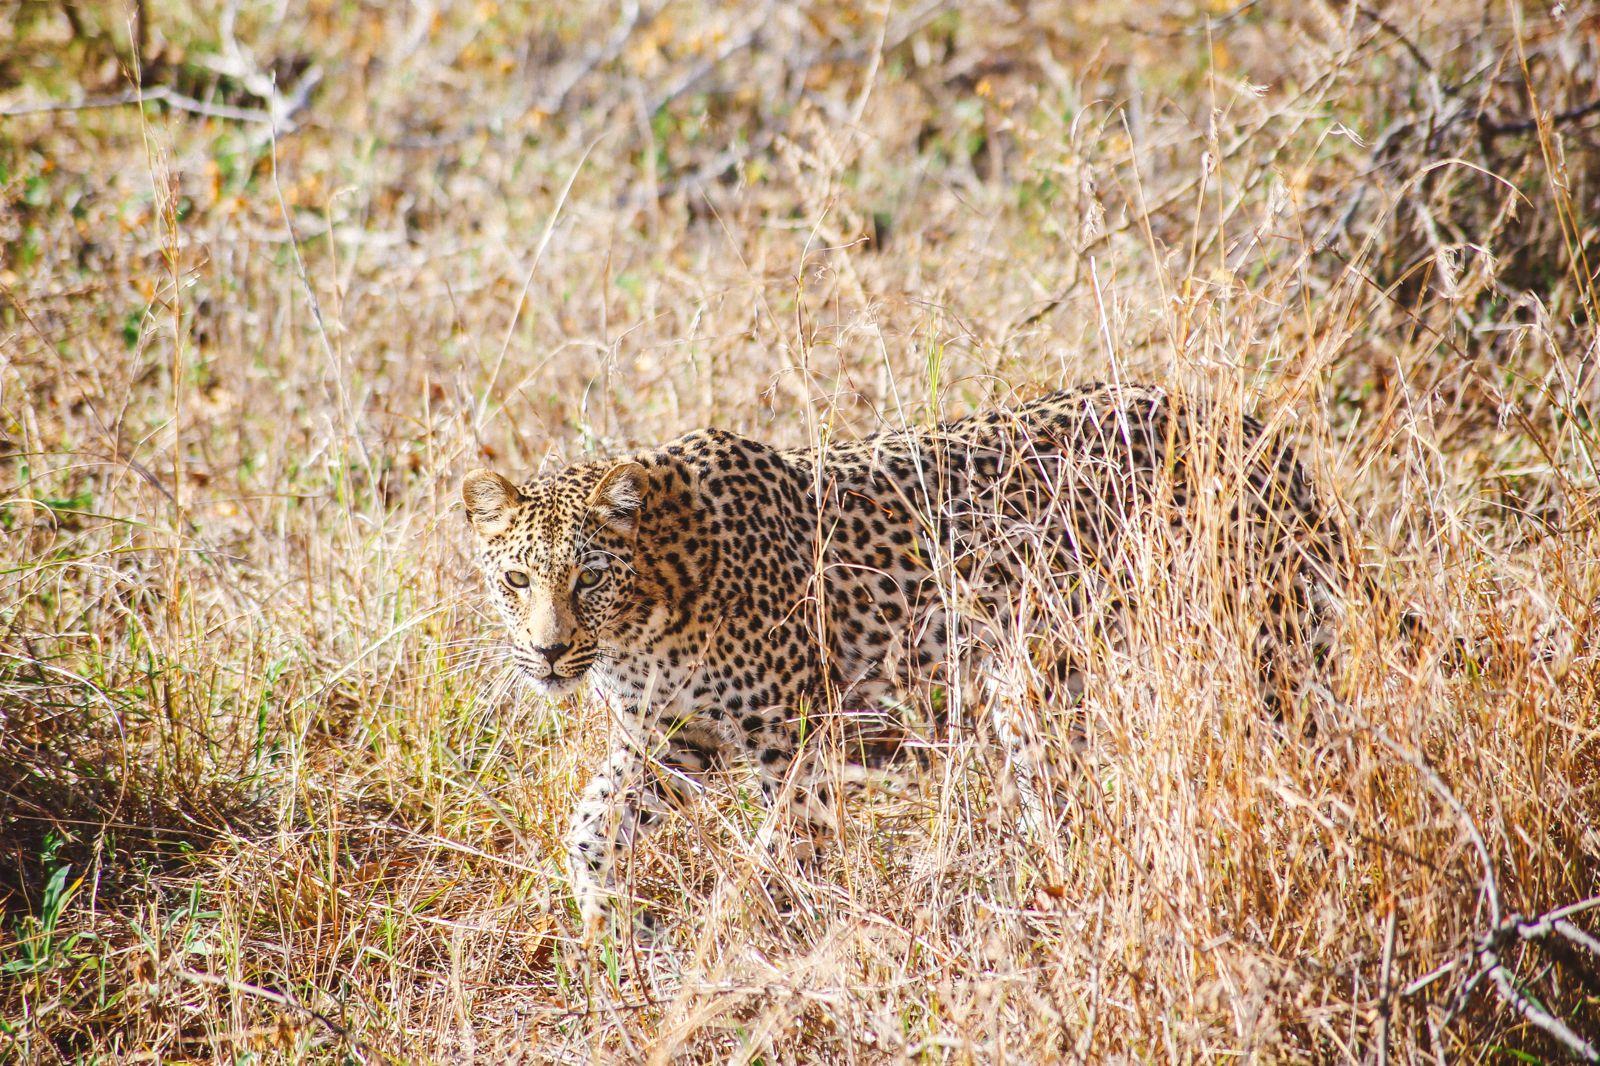 Sunrise Till Sunset - A 24 Hour South African Safari Diary (13)